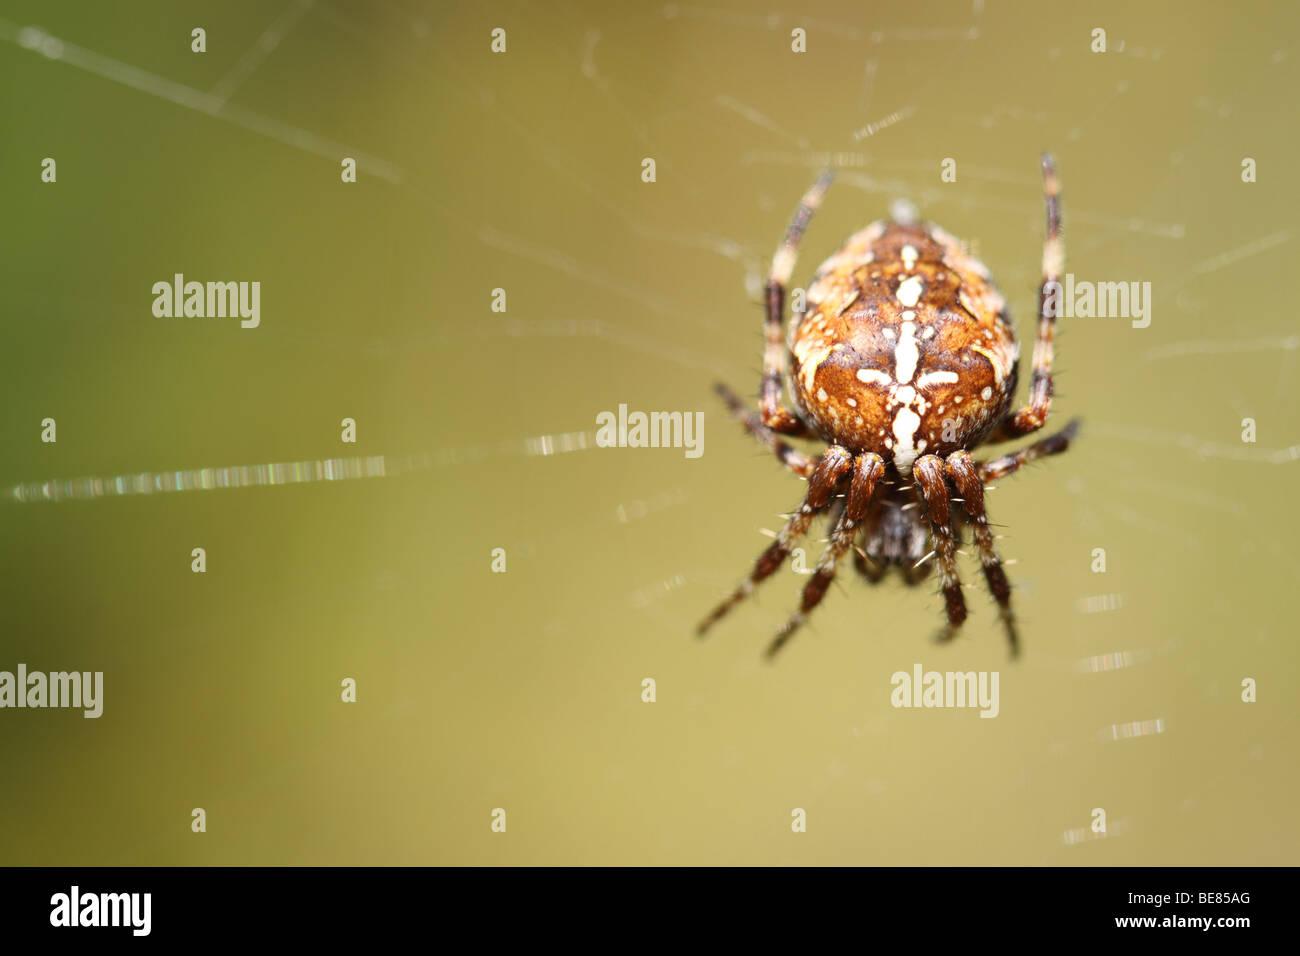 araneus diadematus common garden spider with distinctive white cross on its abdomen in uk september - Common Garden Spider